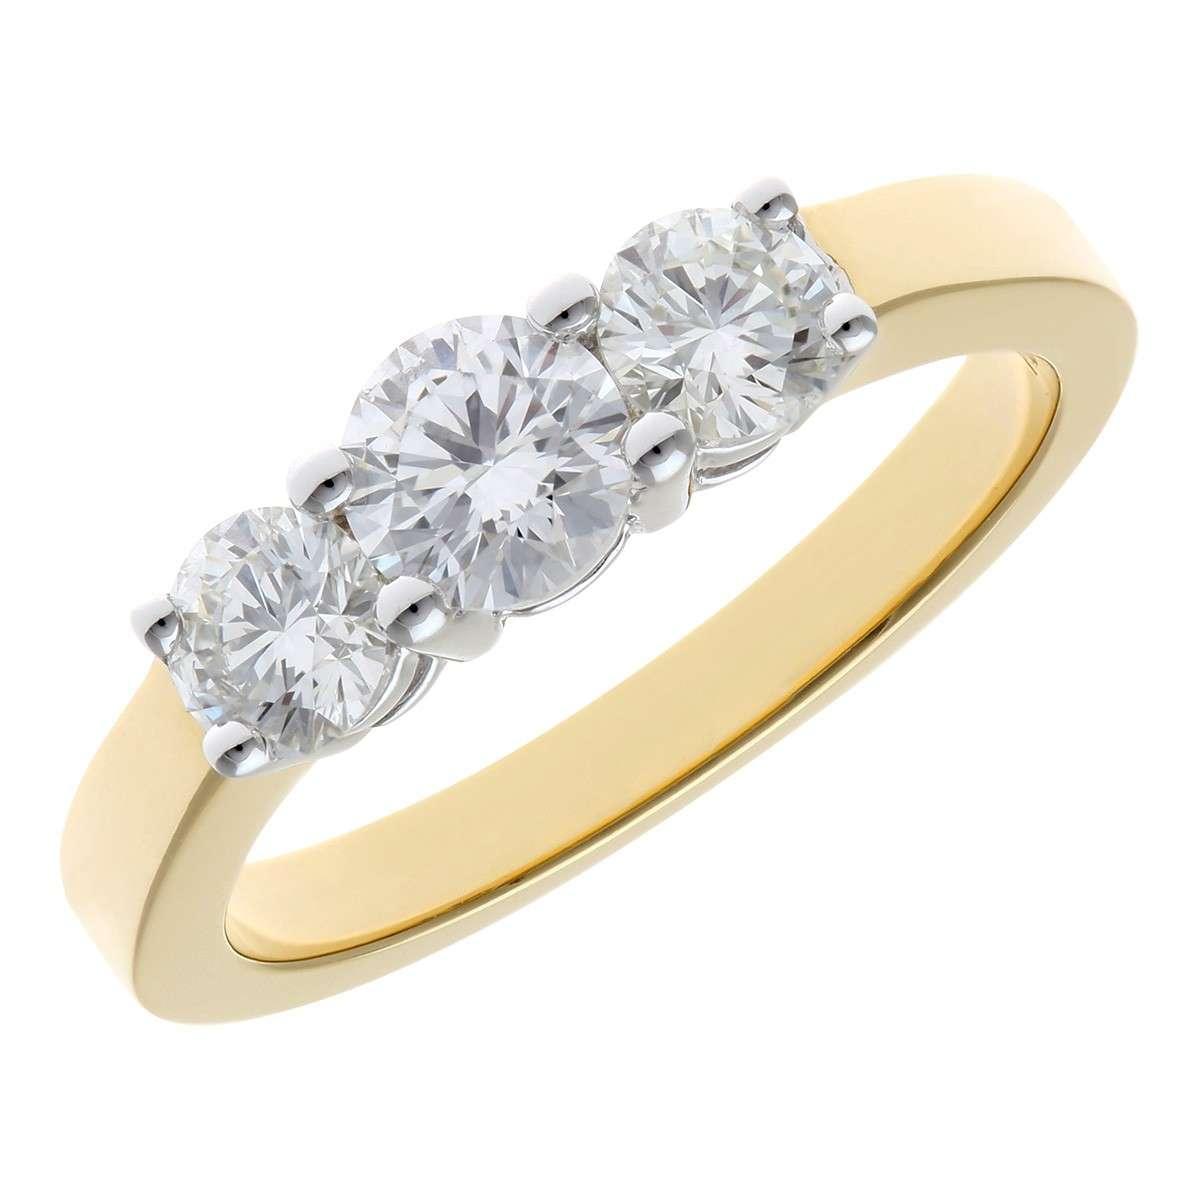 18CT YELLOW GOLD 1.00CT DIAMOND 3 STONE RING